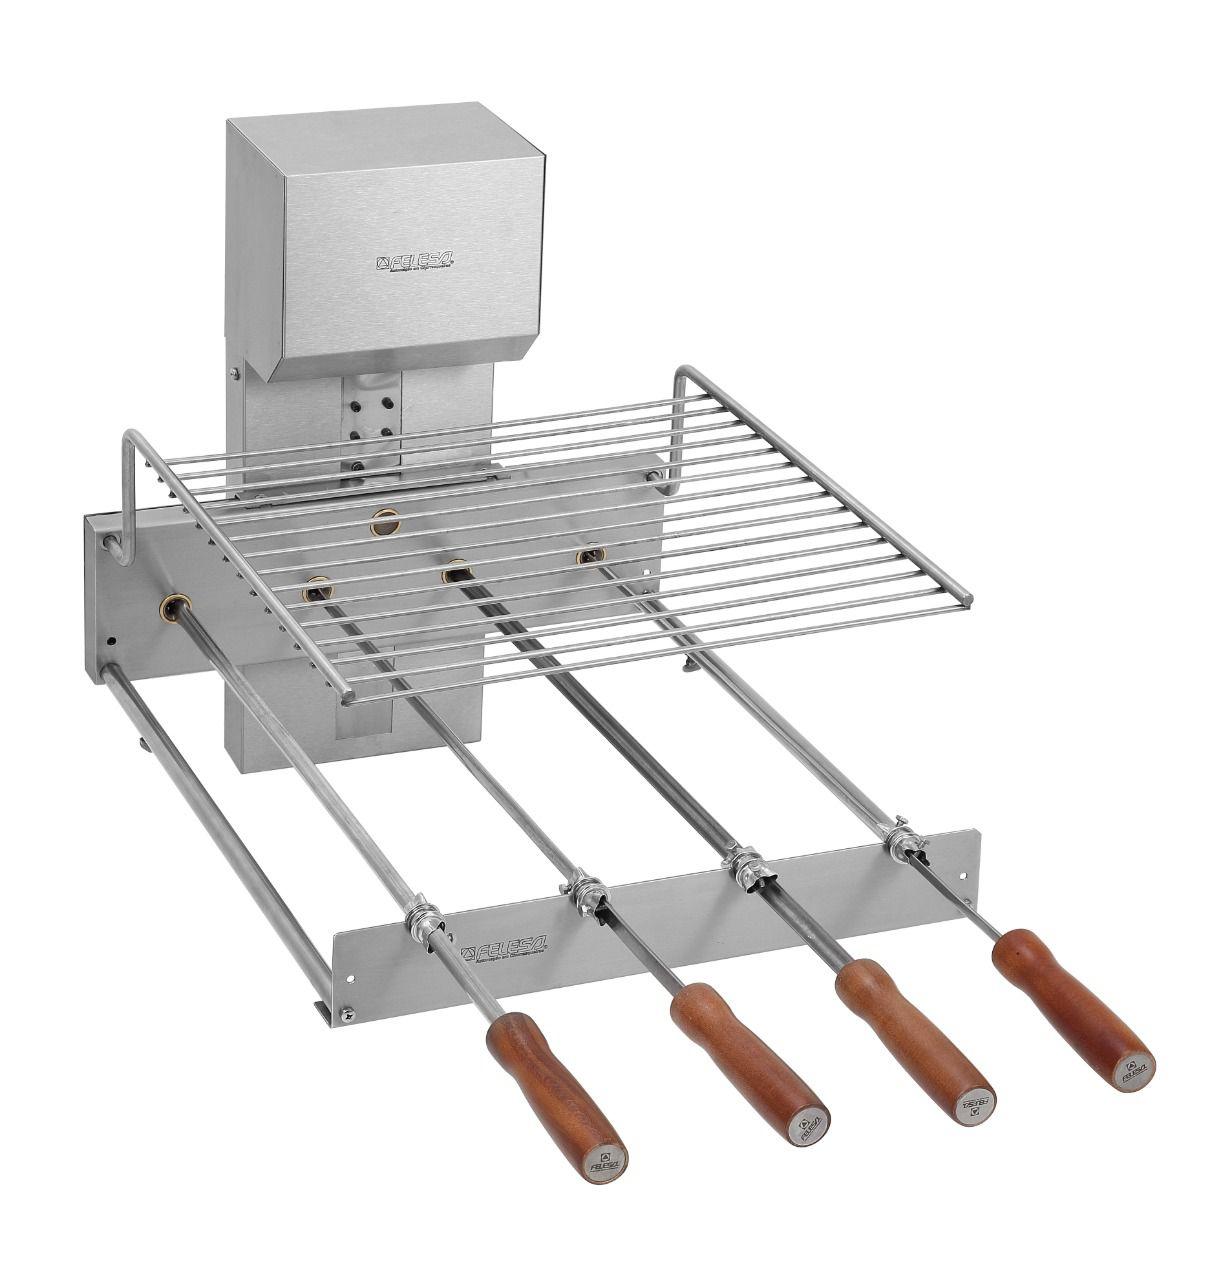 Grill inox elétrico versátil 6 espetos 73cm - Felesa